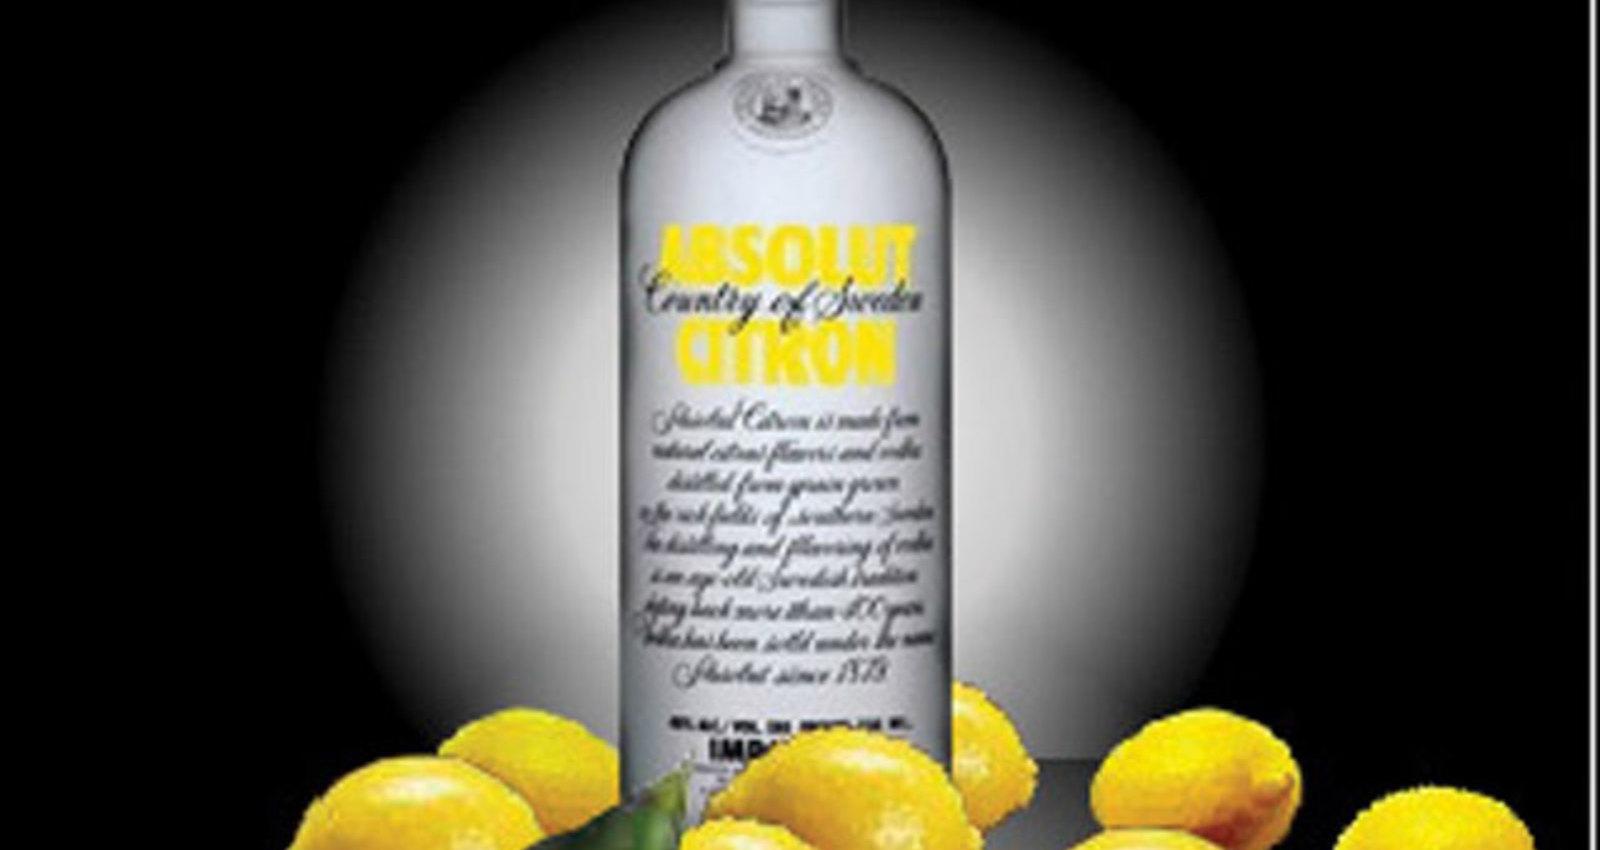 Freshness, Lemon Drop, Citronica